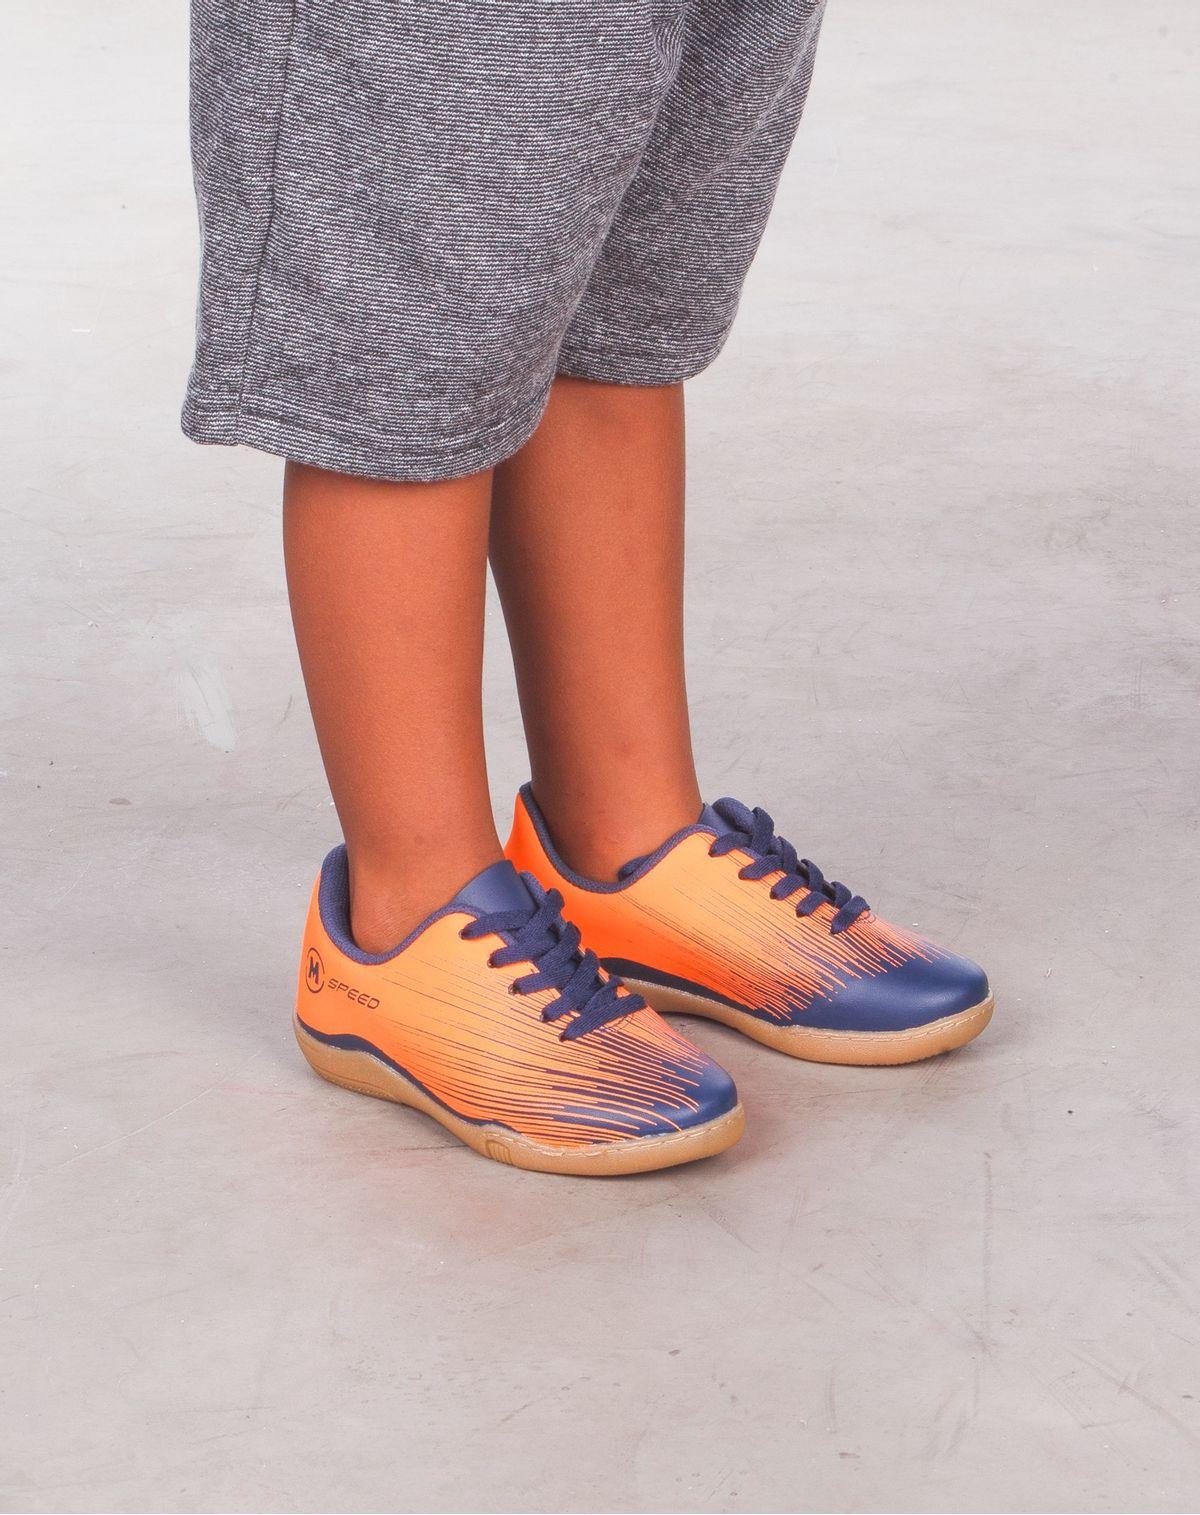 2050006230855-Chuteira-Futsal-Infantil-Molekinho-Speed-MARINHO-31-1-2-3-4-5-6